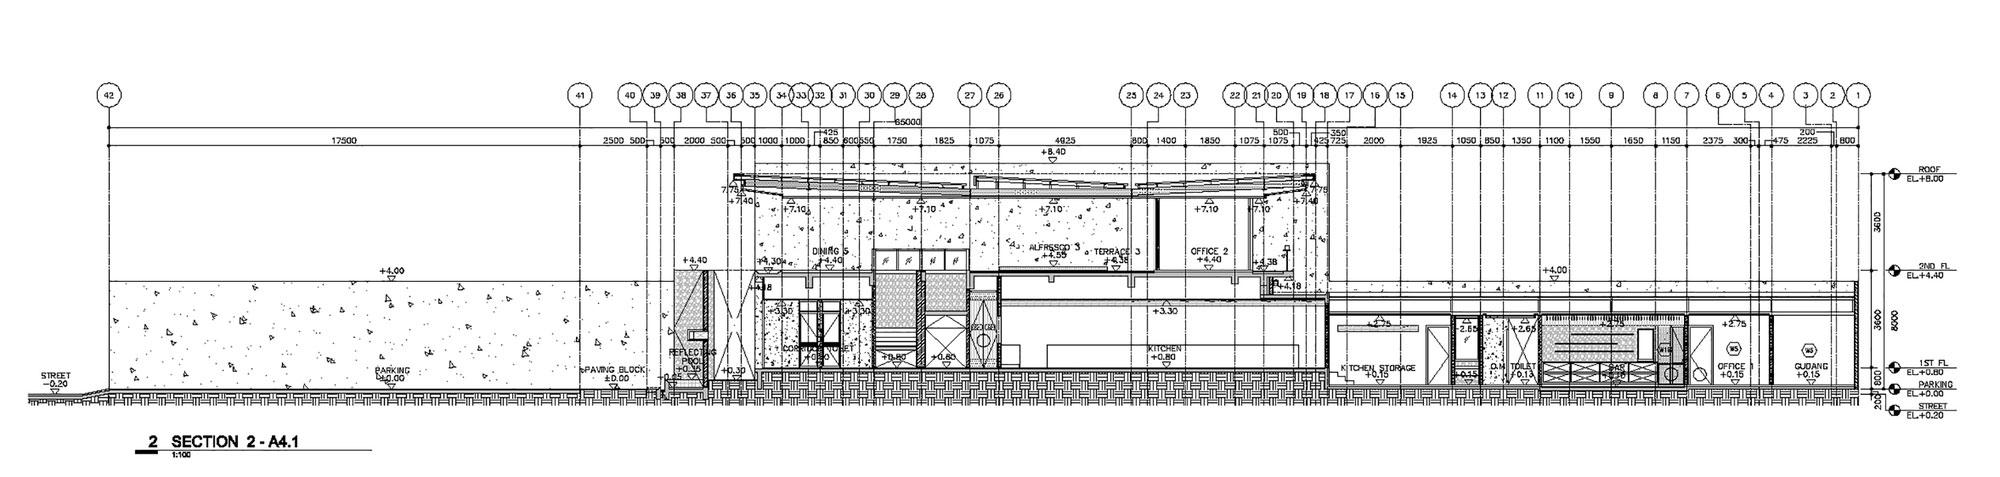 Stylish Tropical Paradise Theme of Lemongrass Restaurant Designed by Einstein & Associates-27